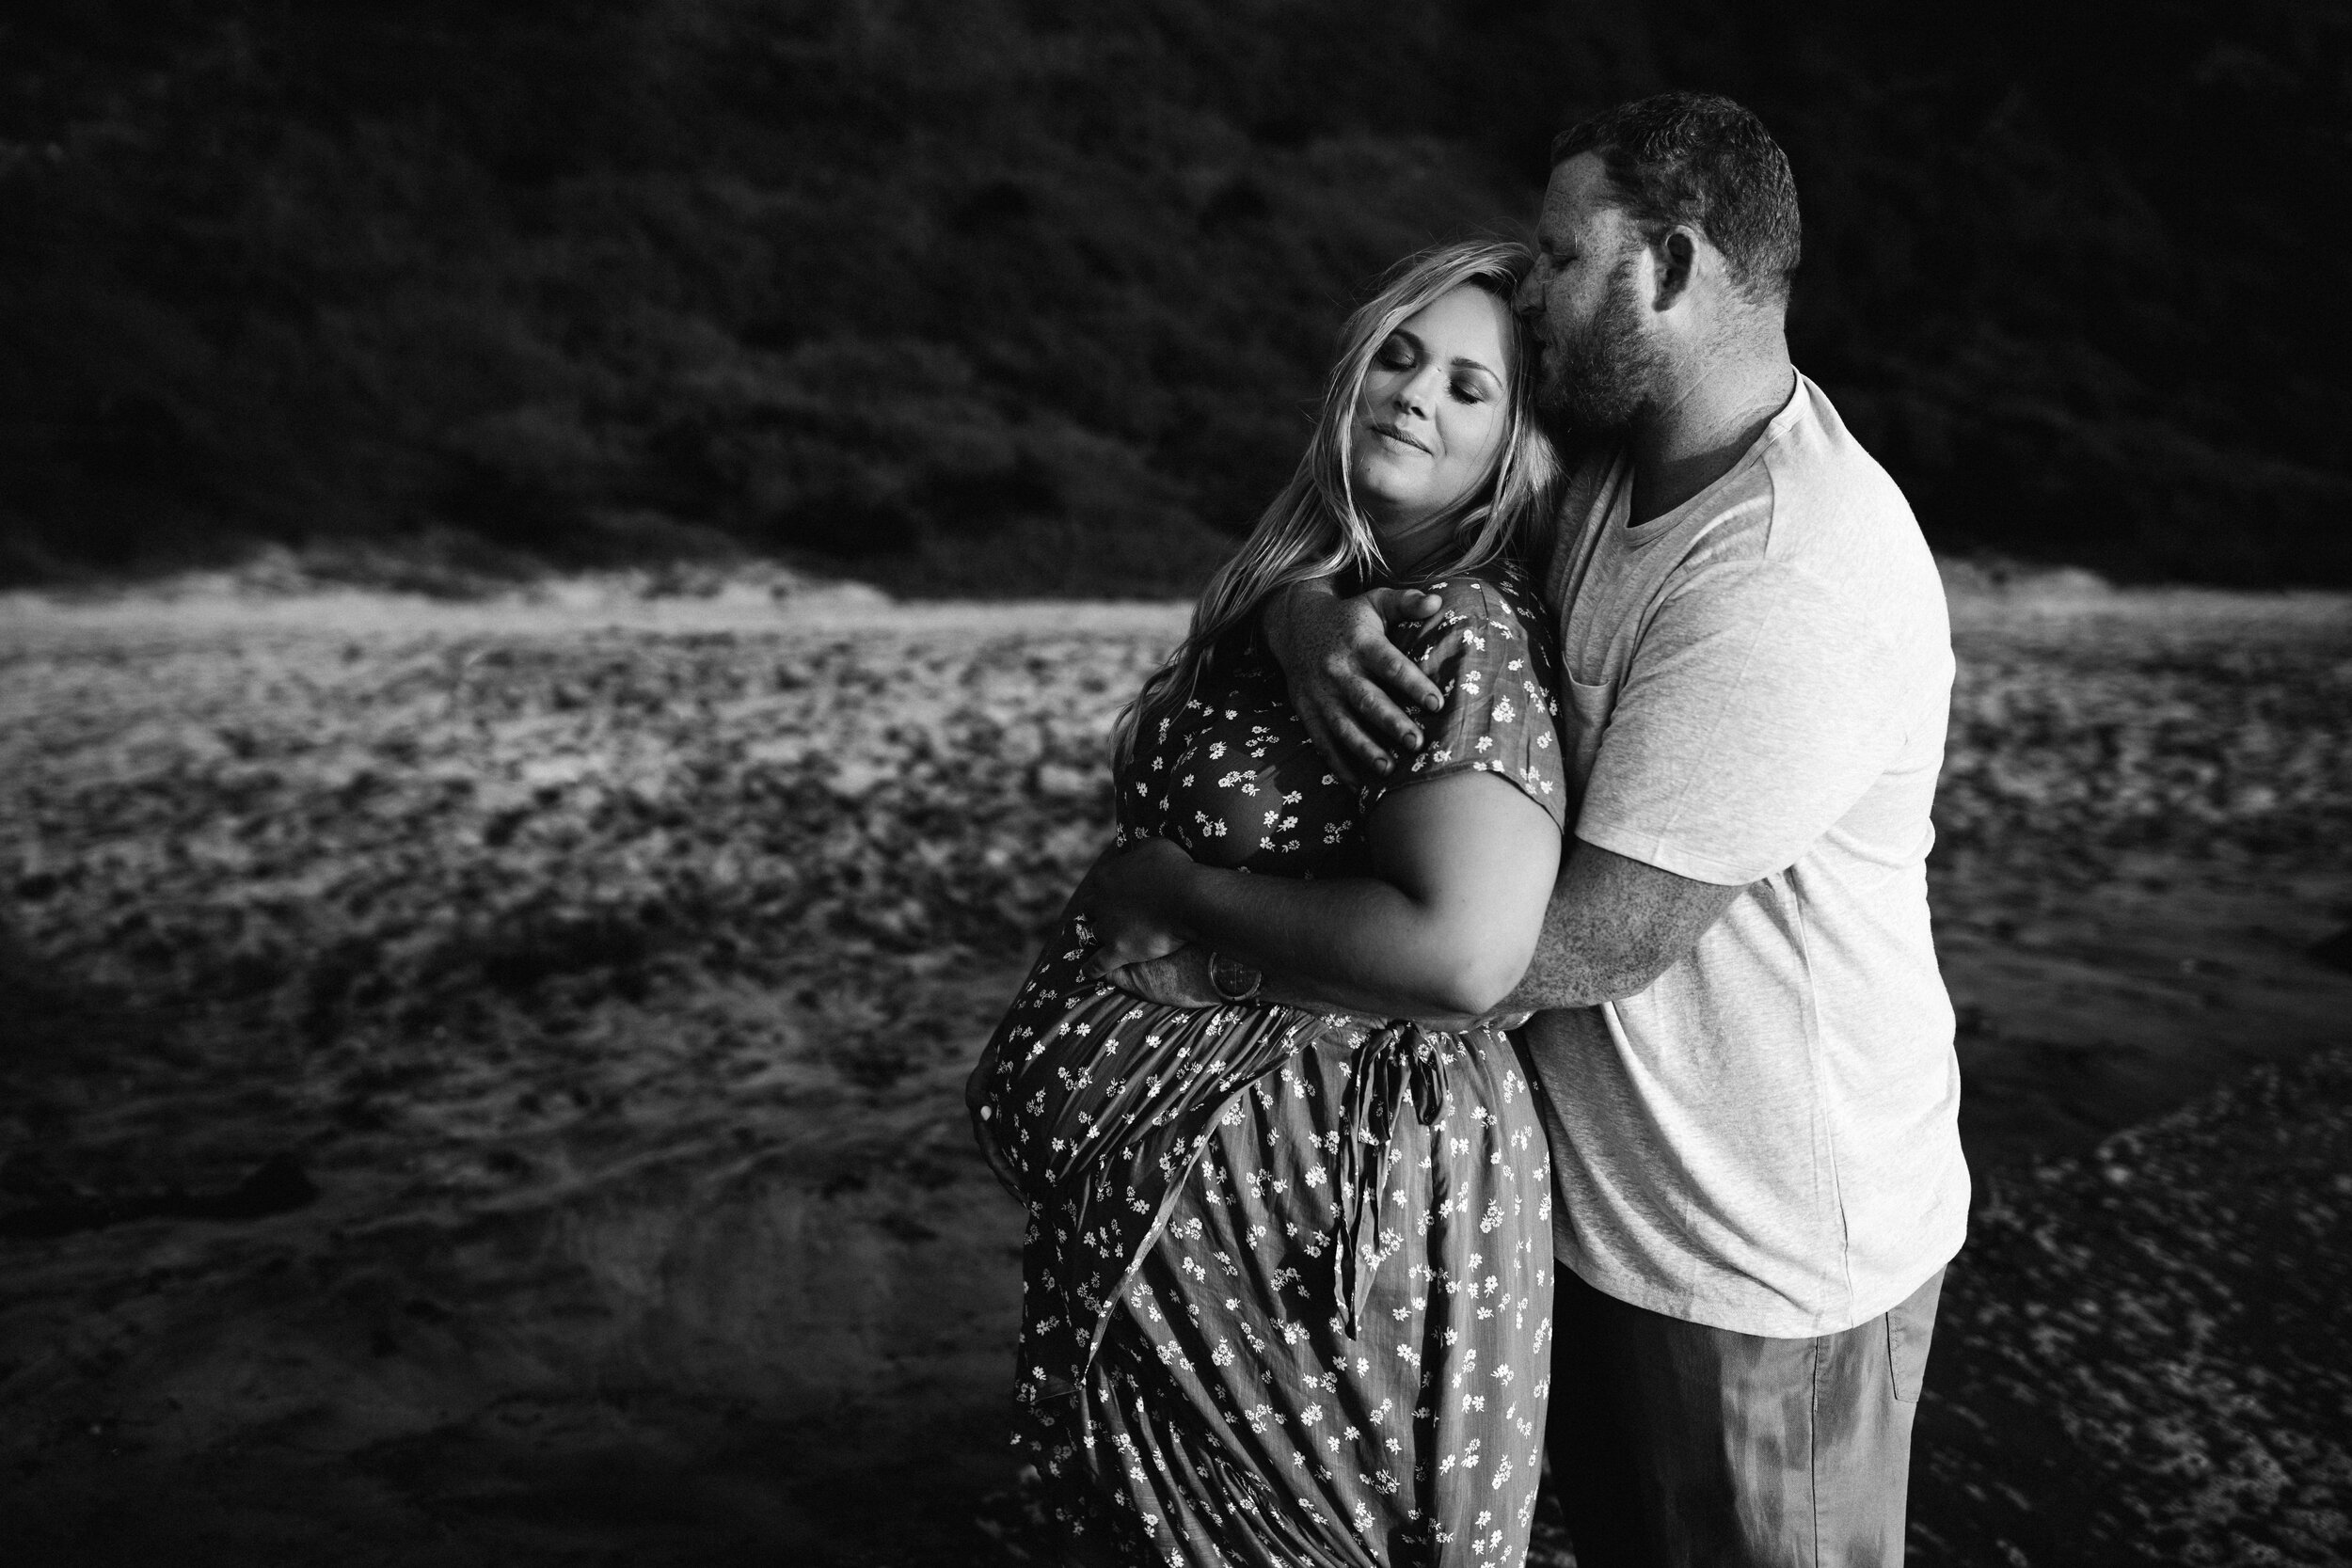 maternity photoshoot on beach - Lindsay Petty Photography